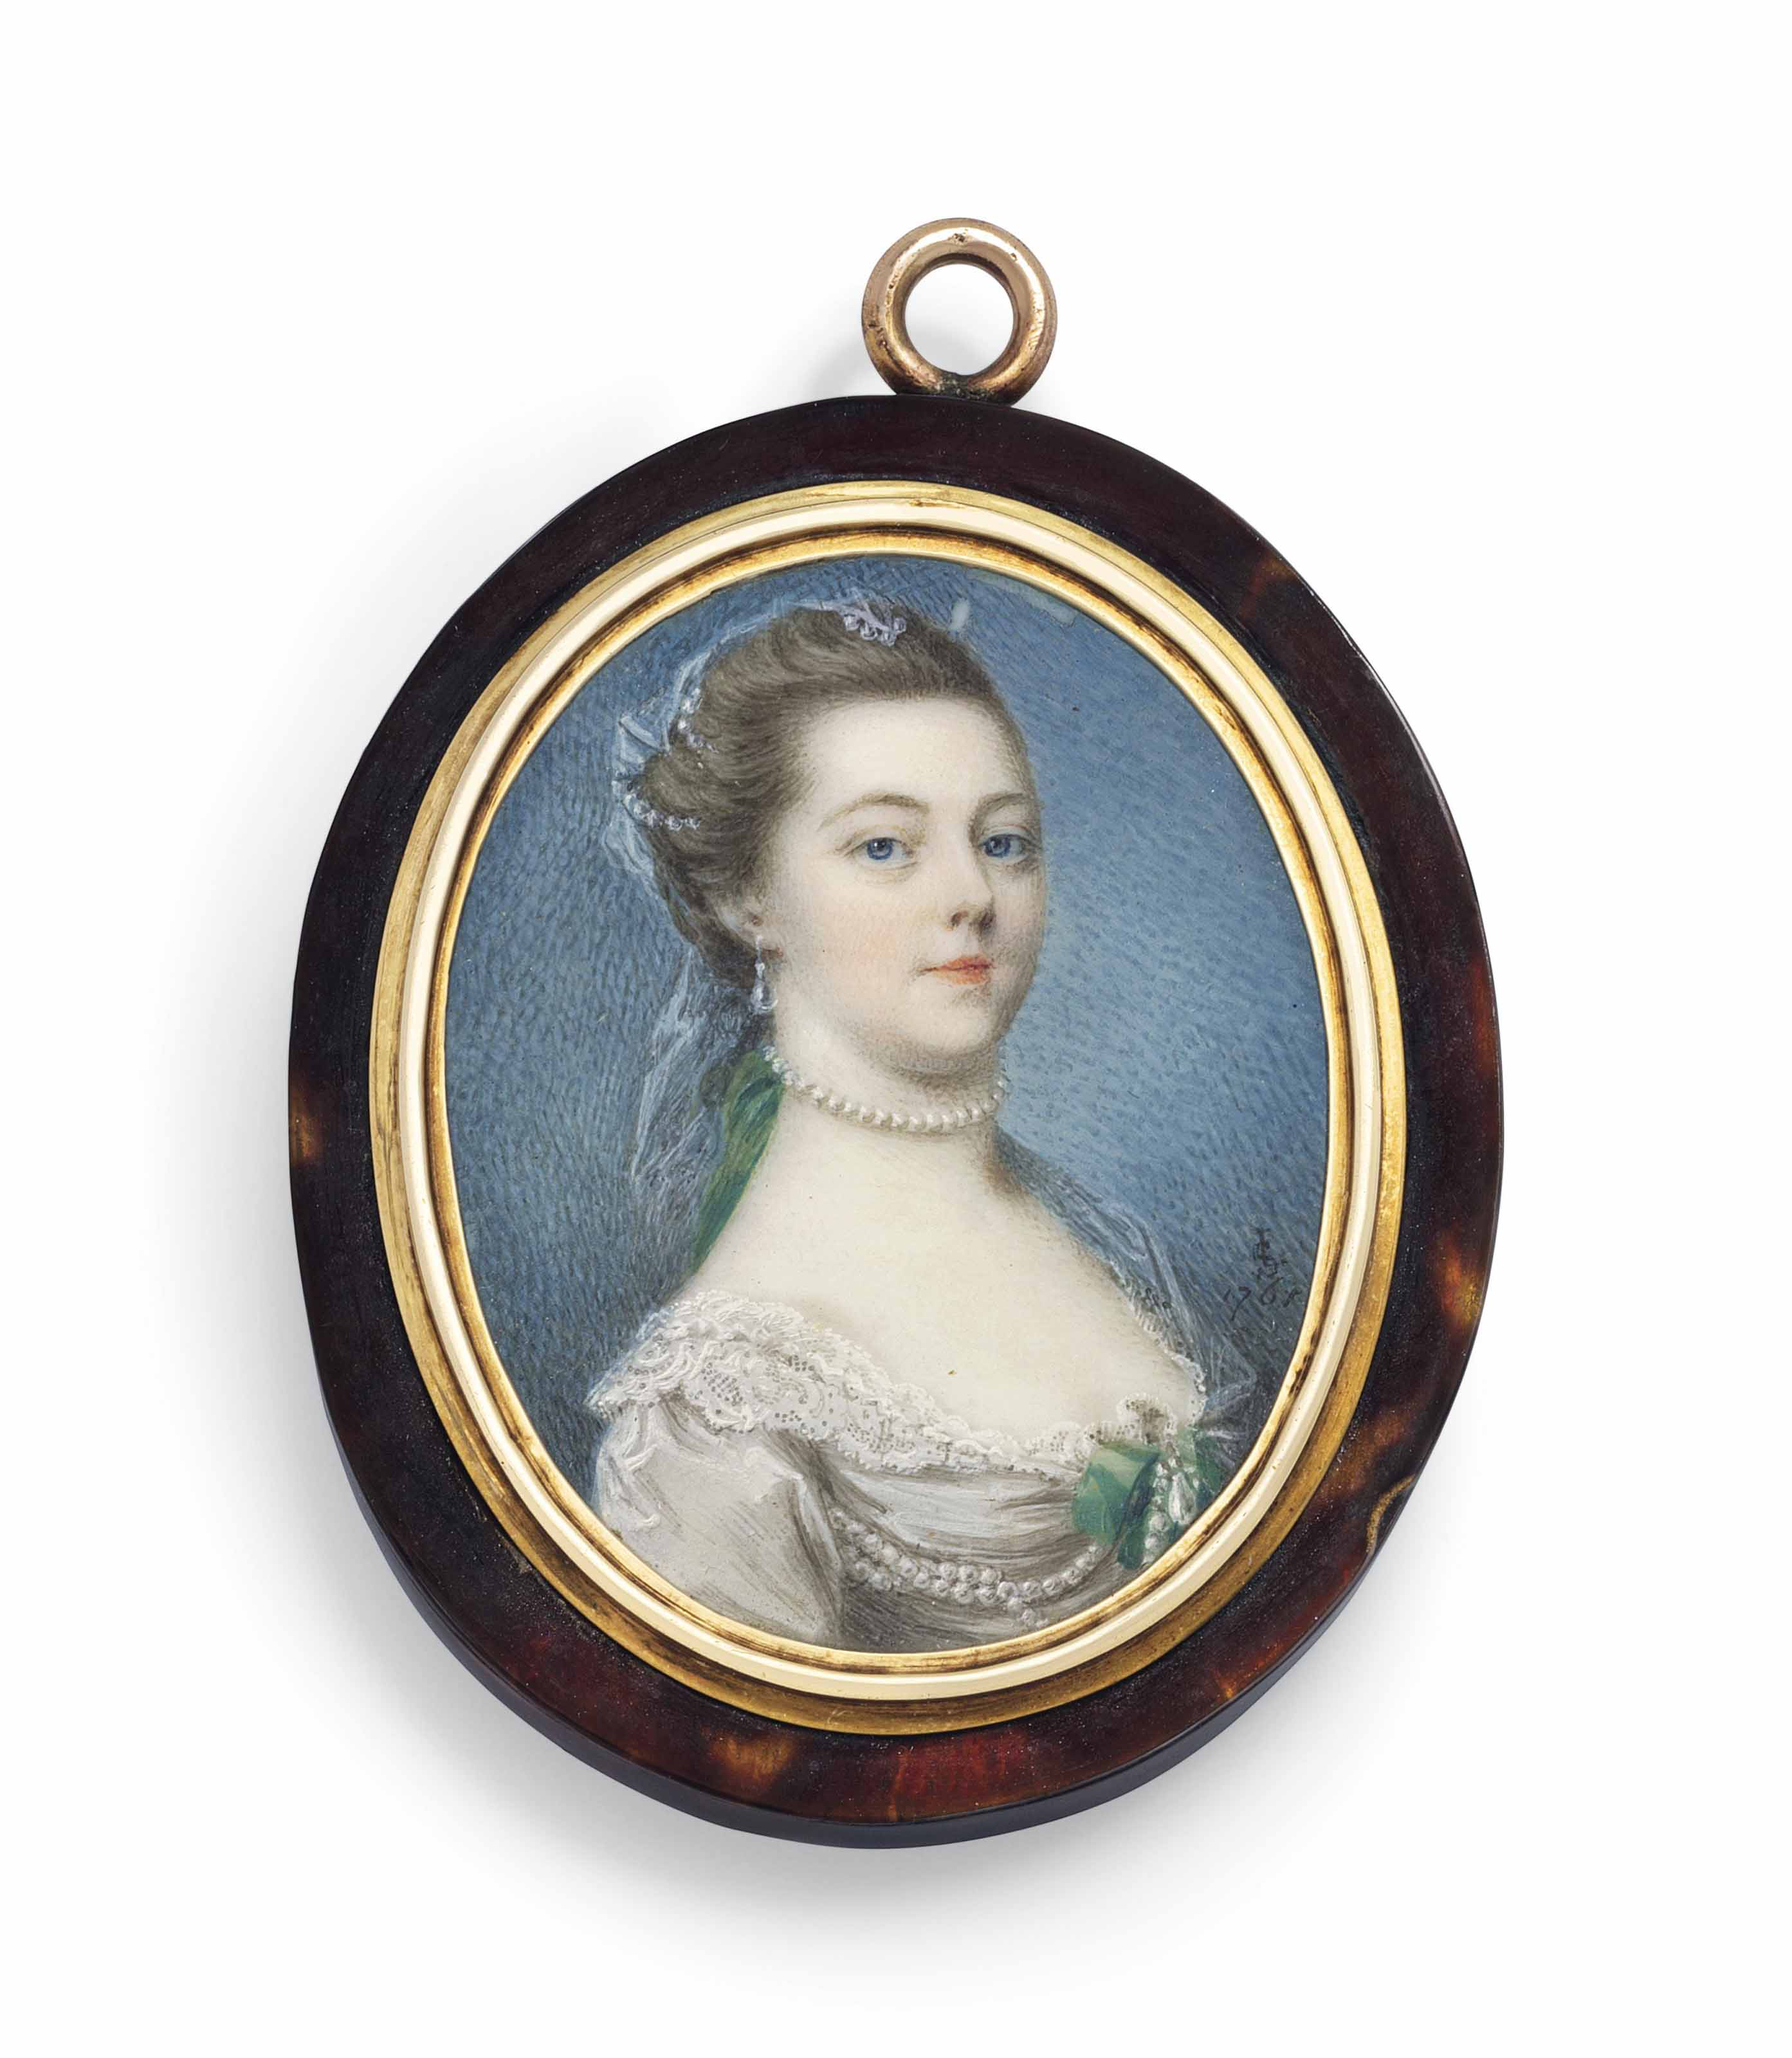 LUKE SULLIVAN (BRITISH, 1705-1771)